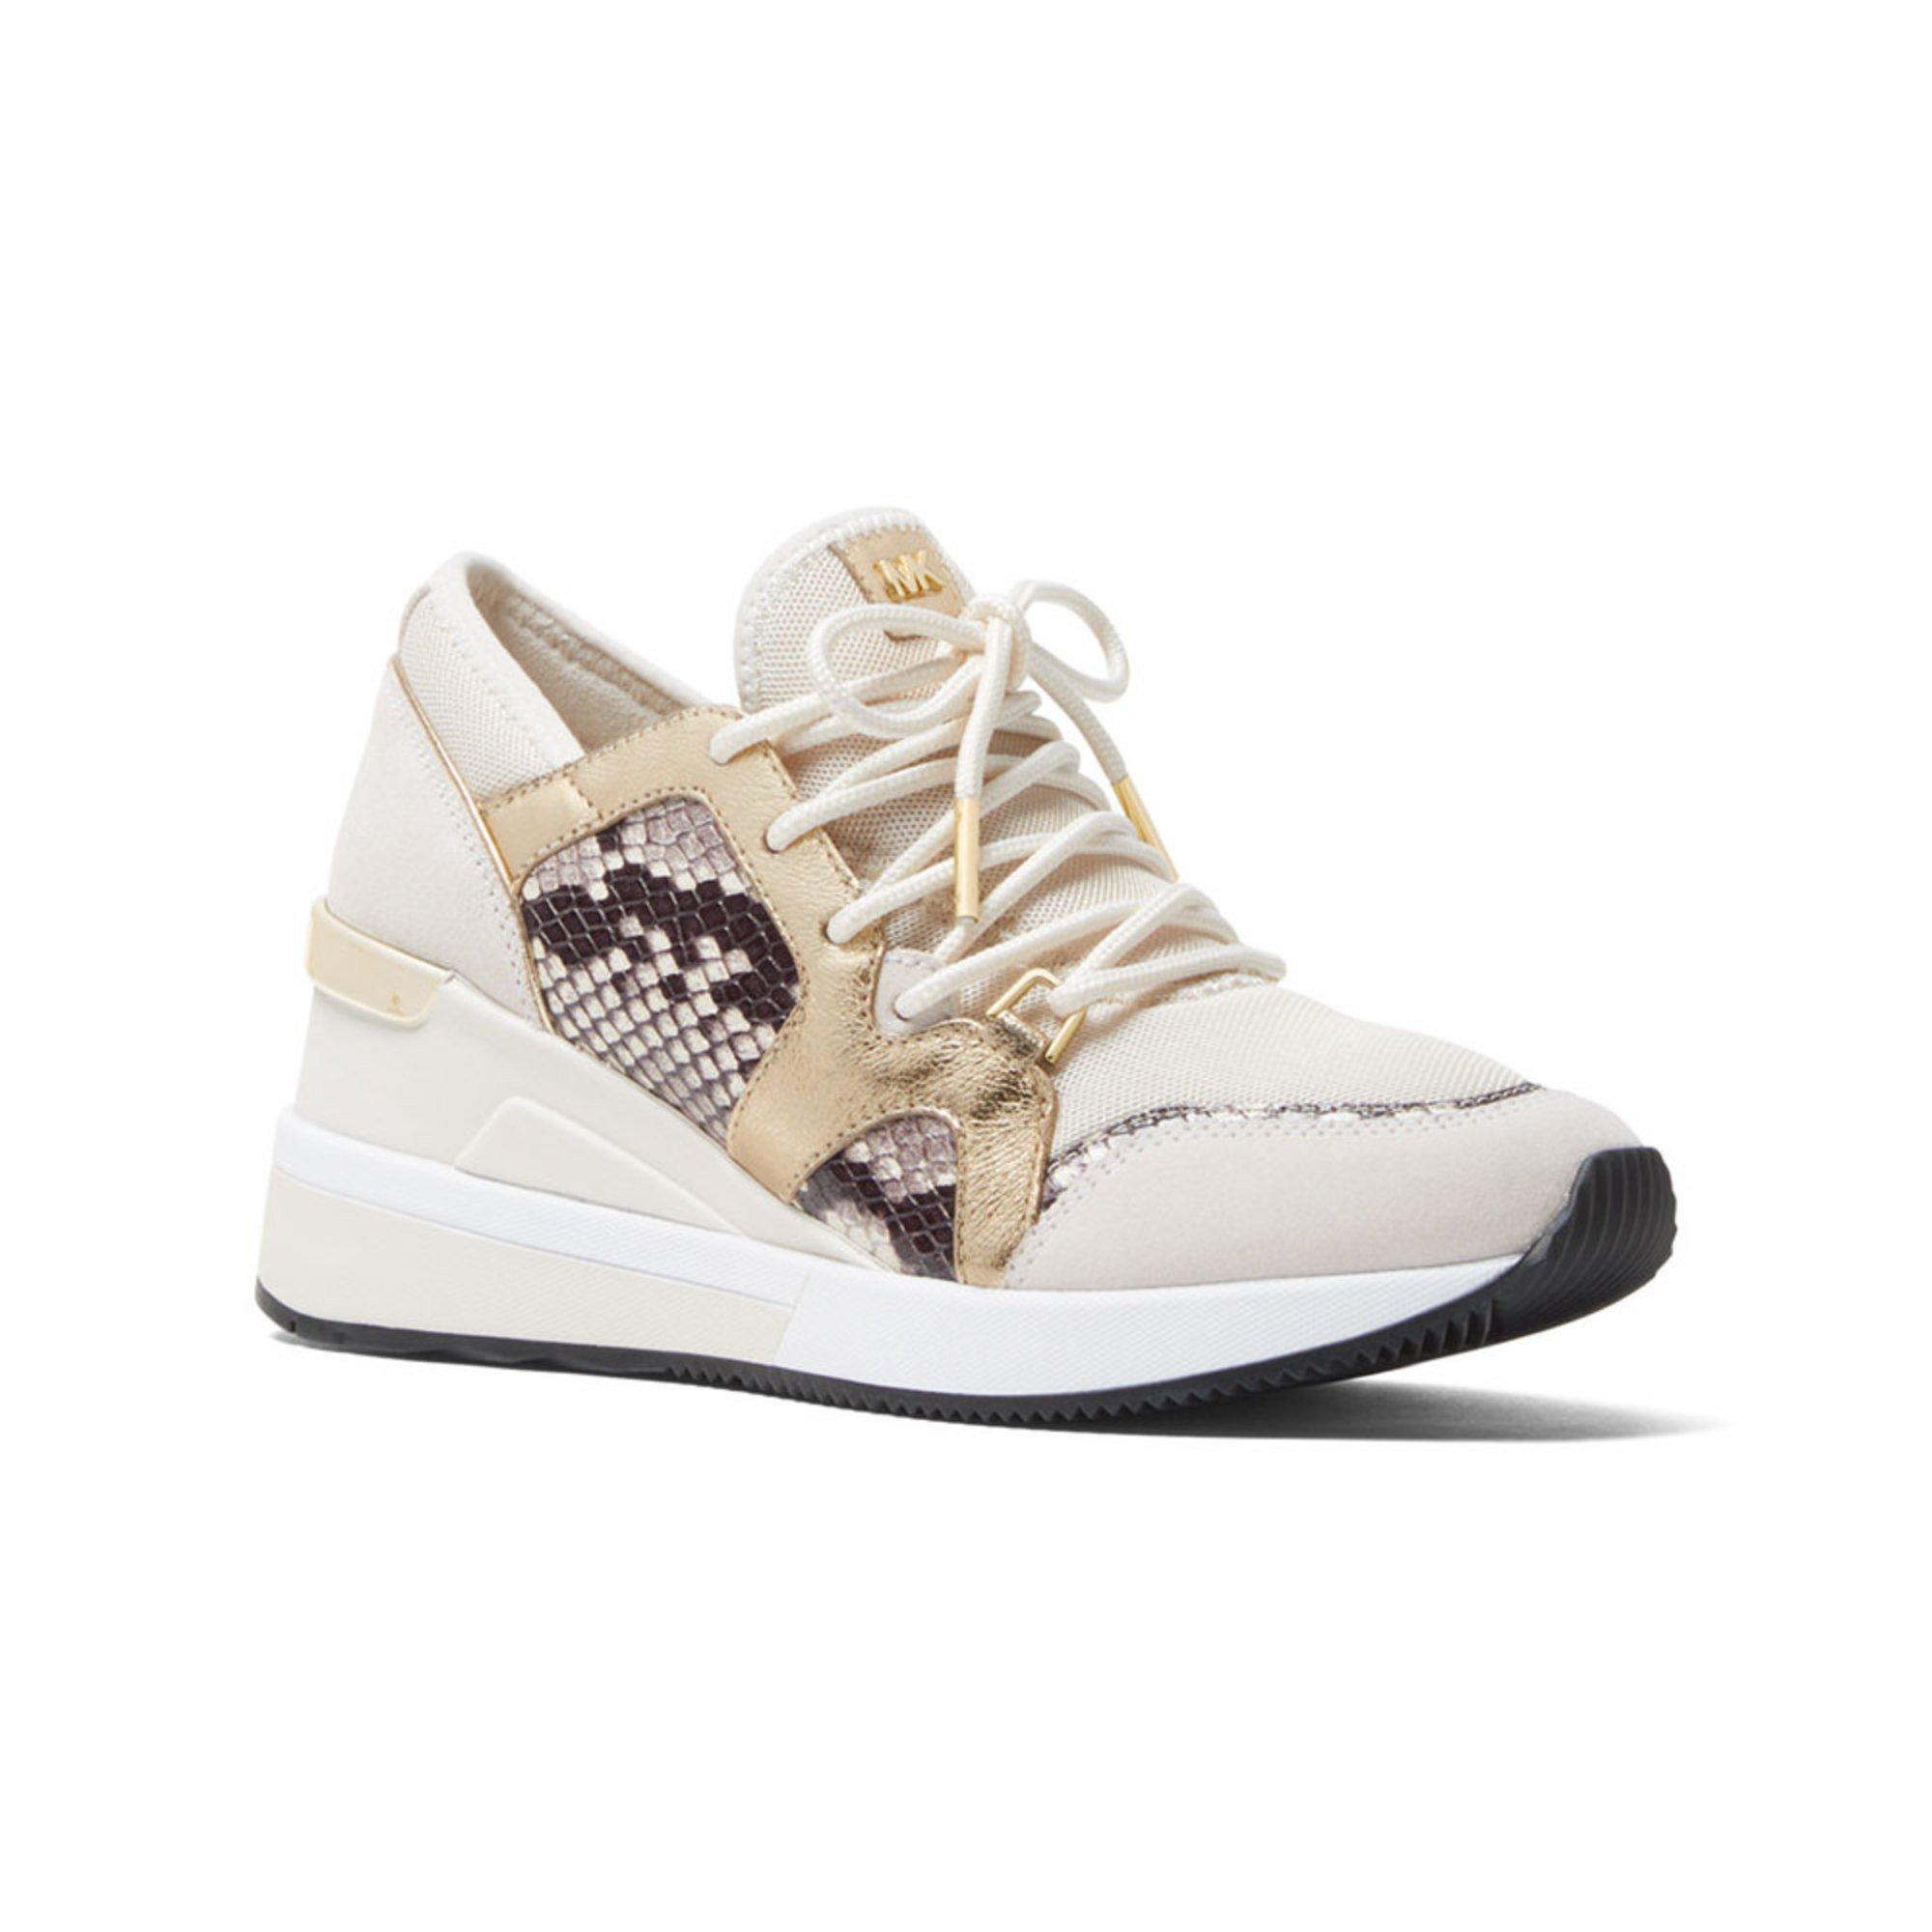 8bc9639adfcb Michael Kors. Michael Kors Women s Liv Trainer Sneaker